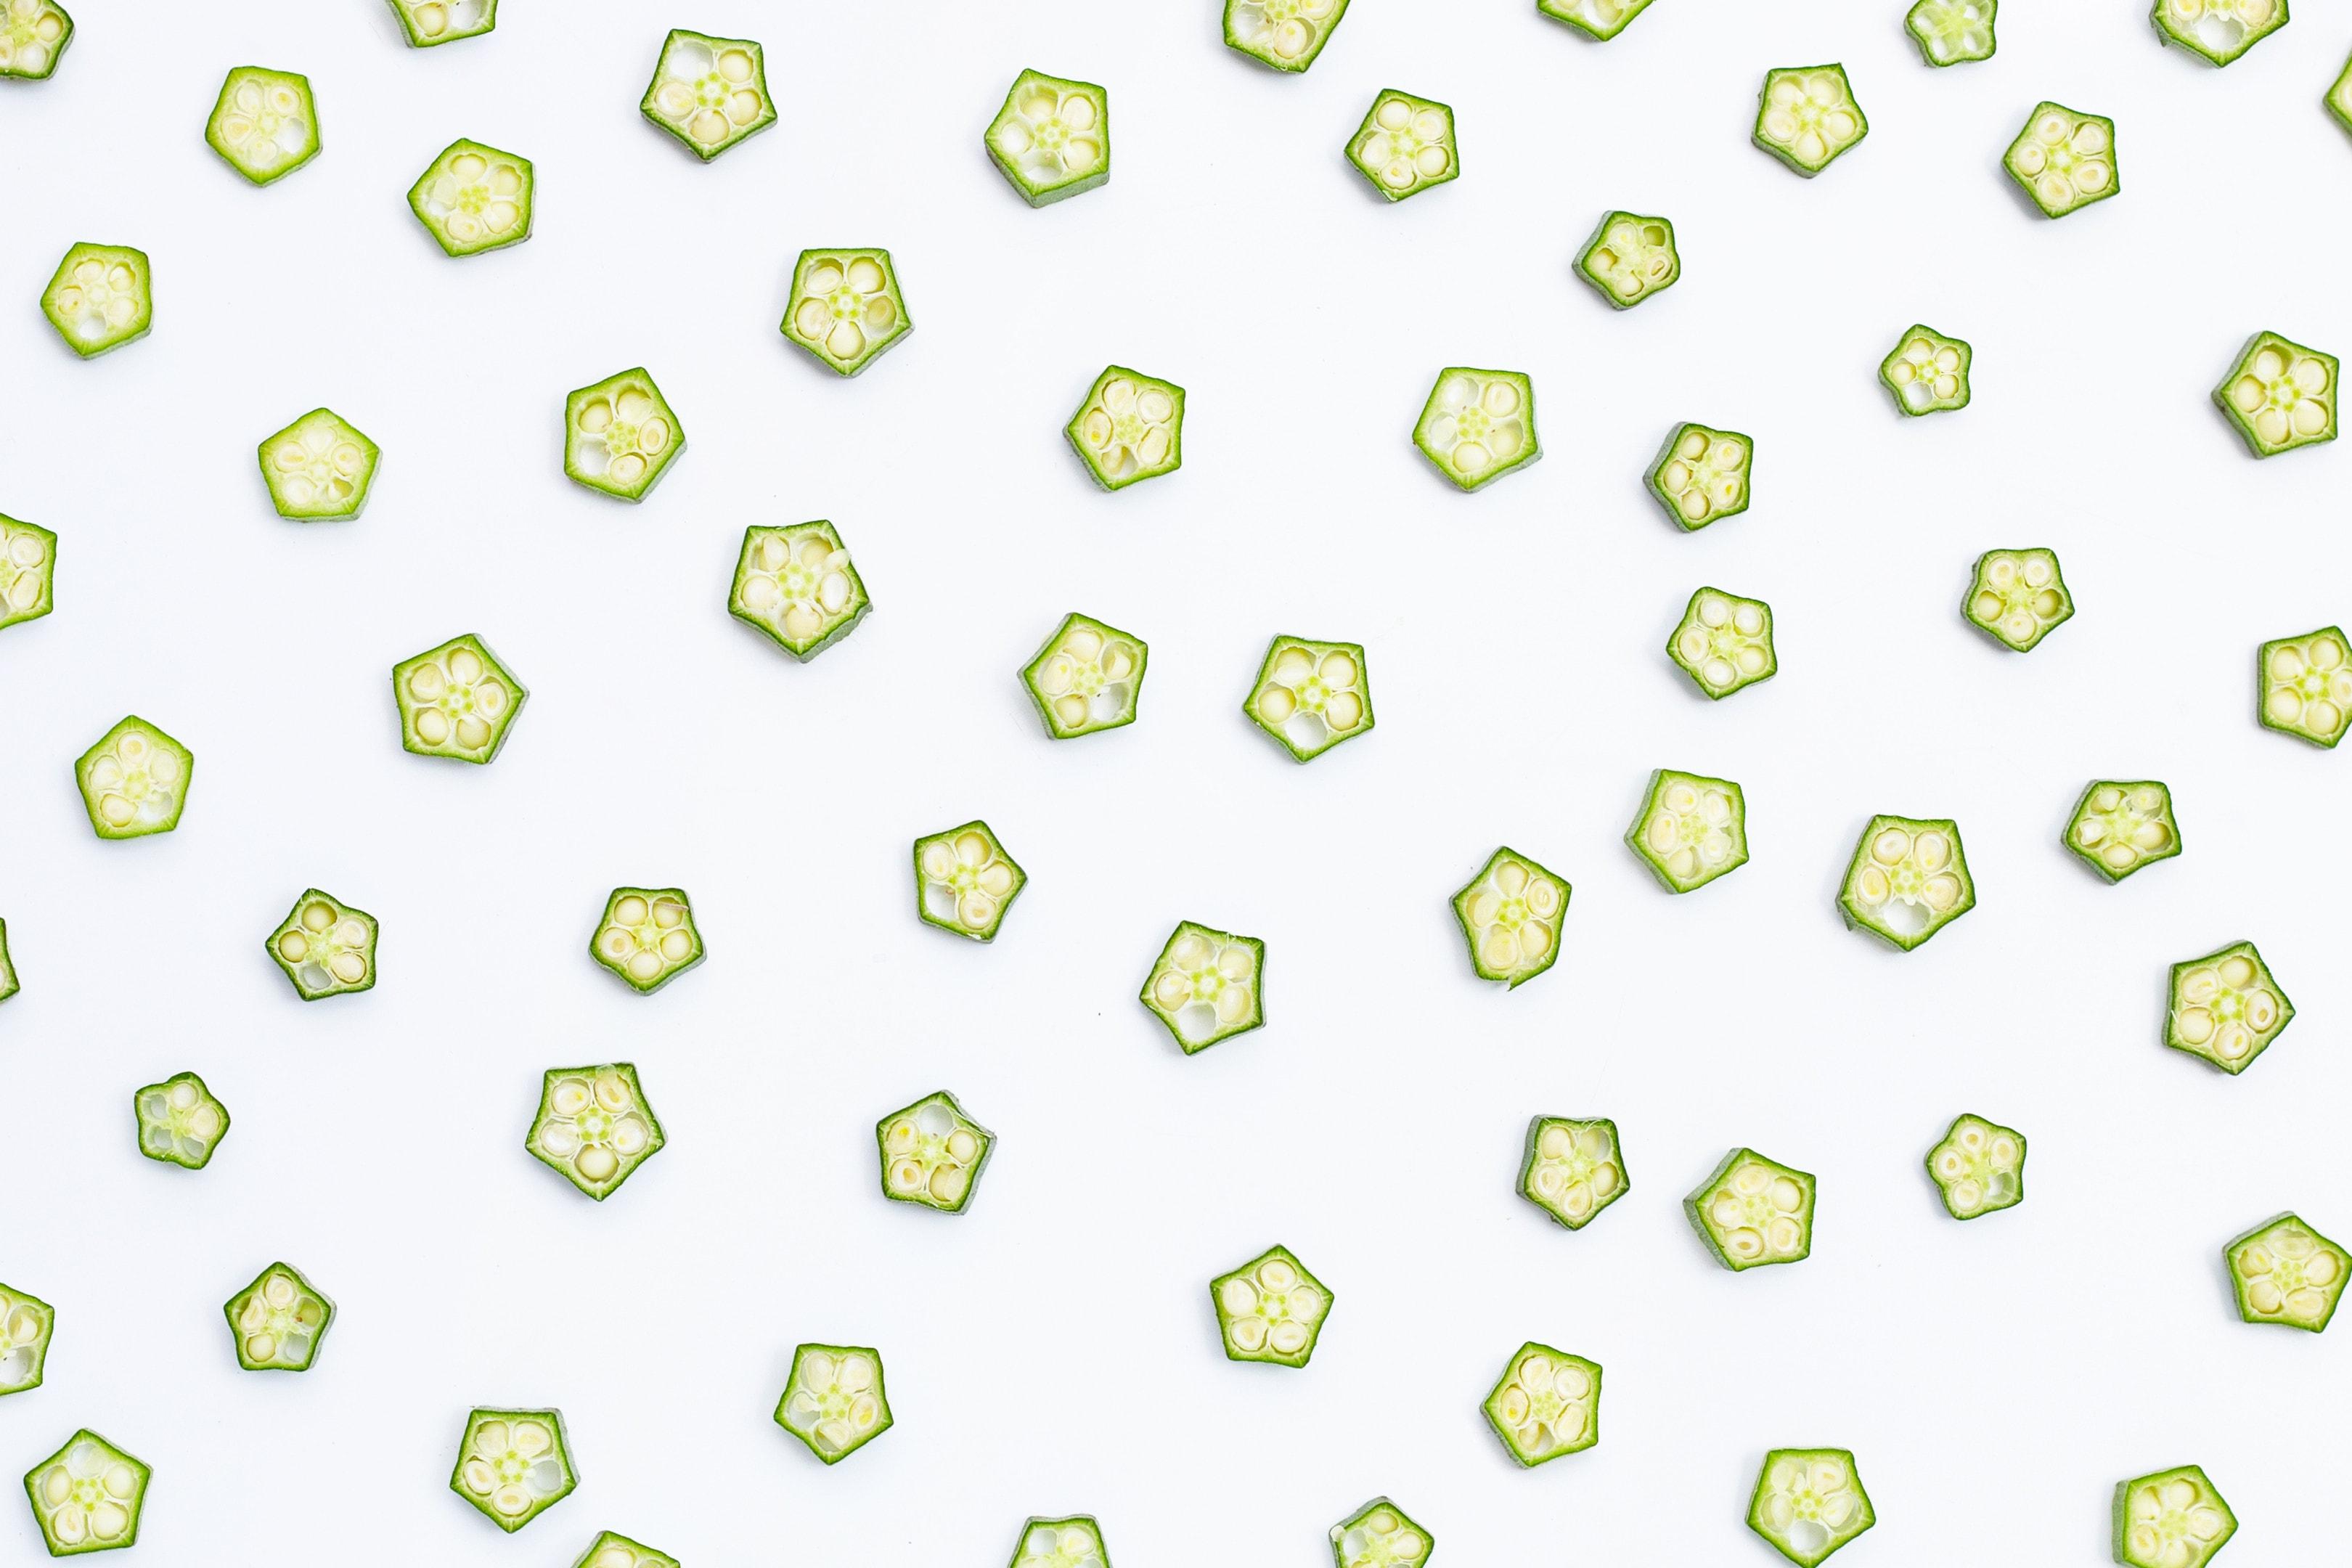 Fresh okra slices on white background